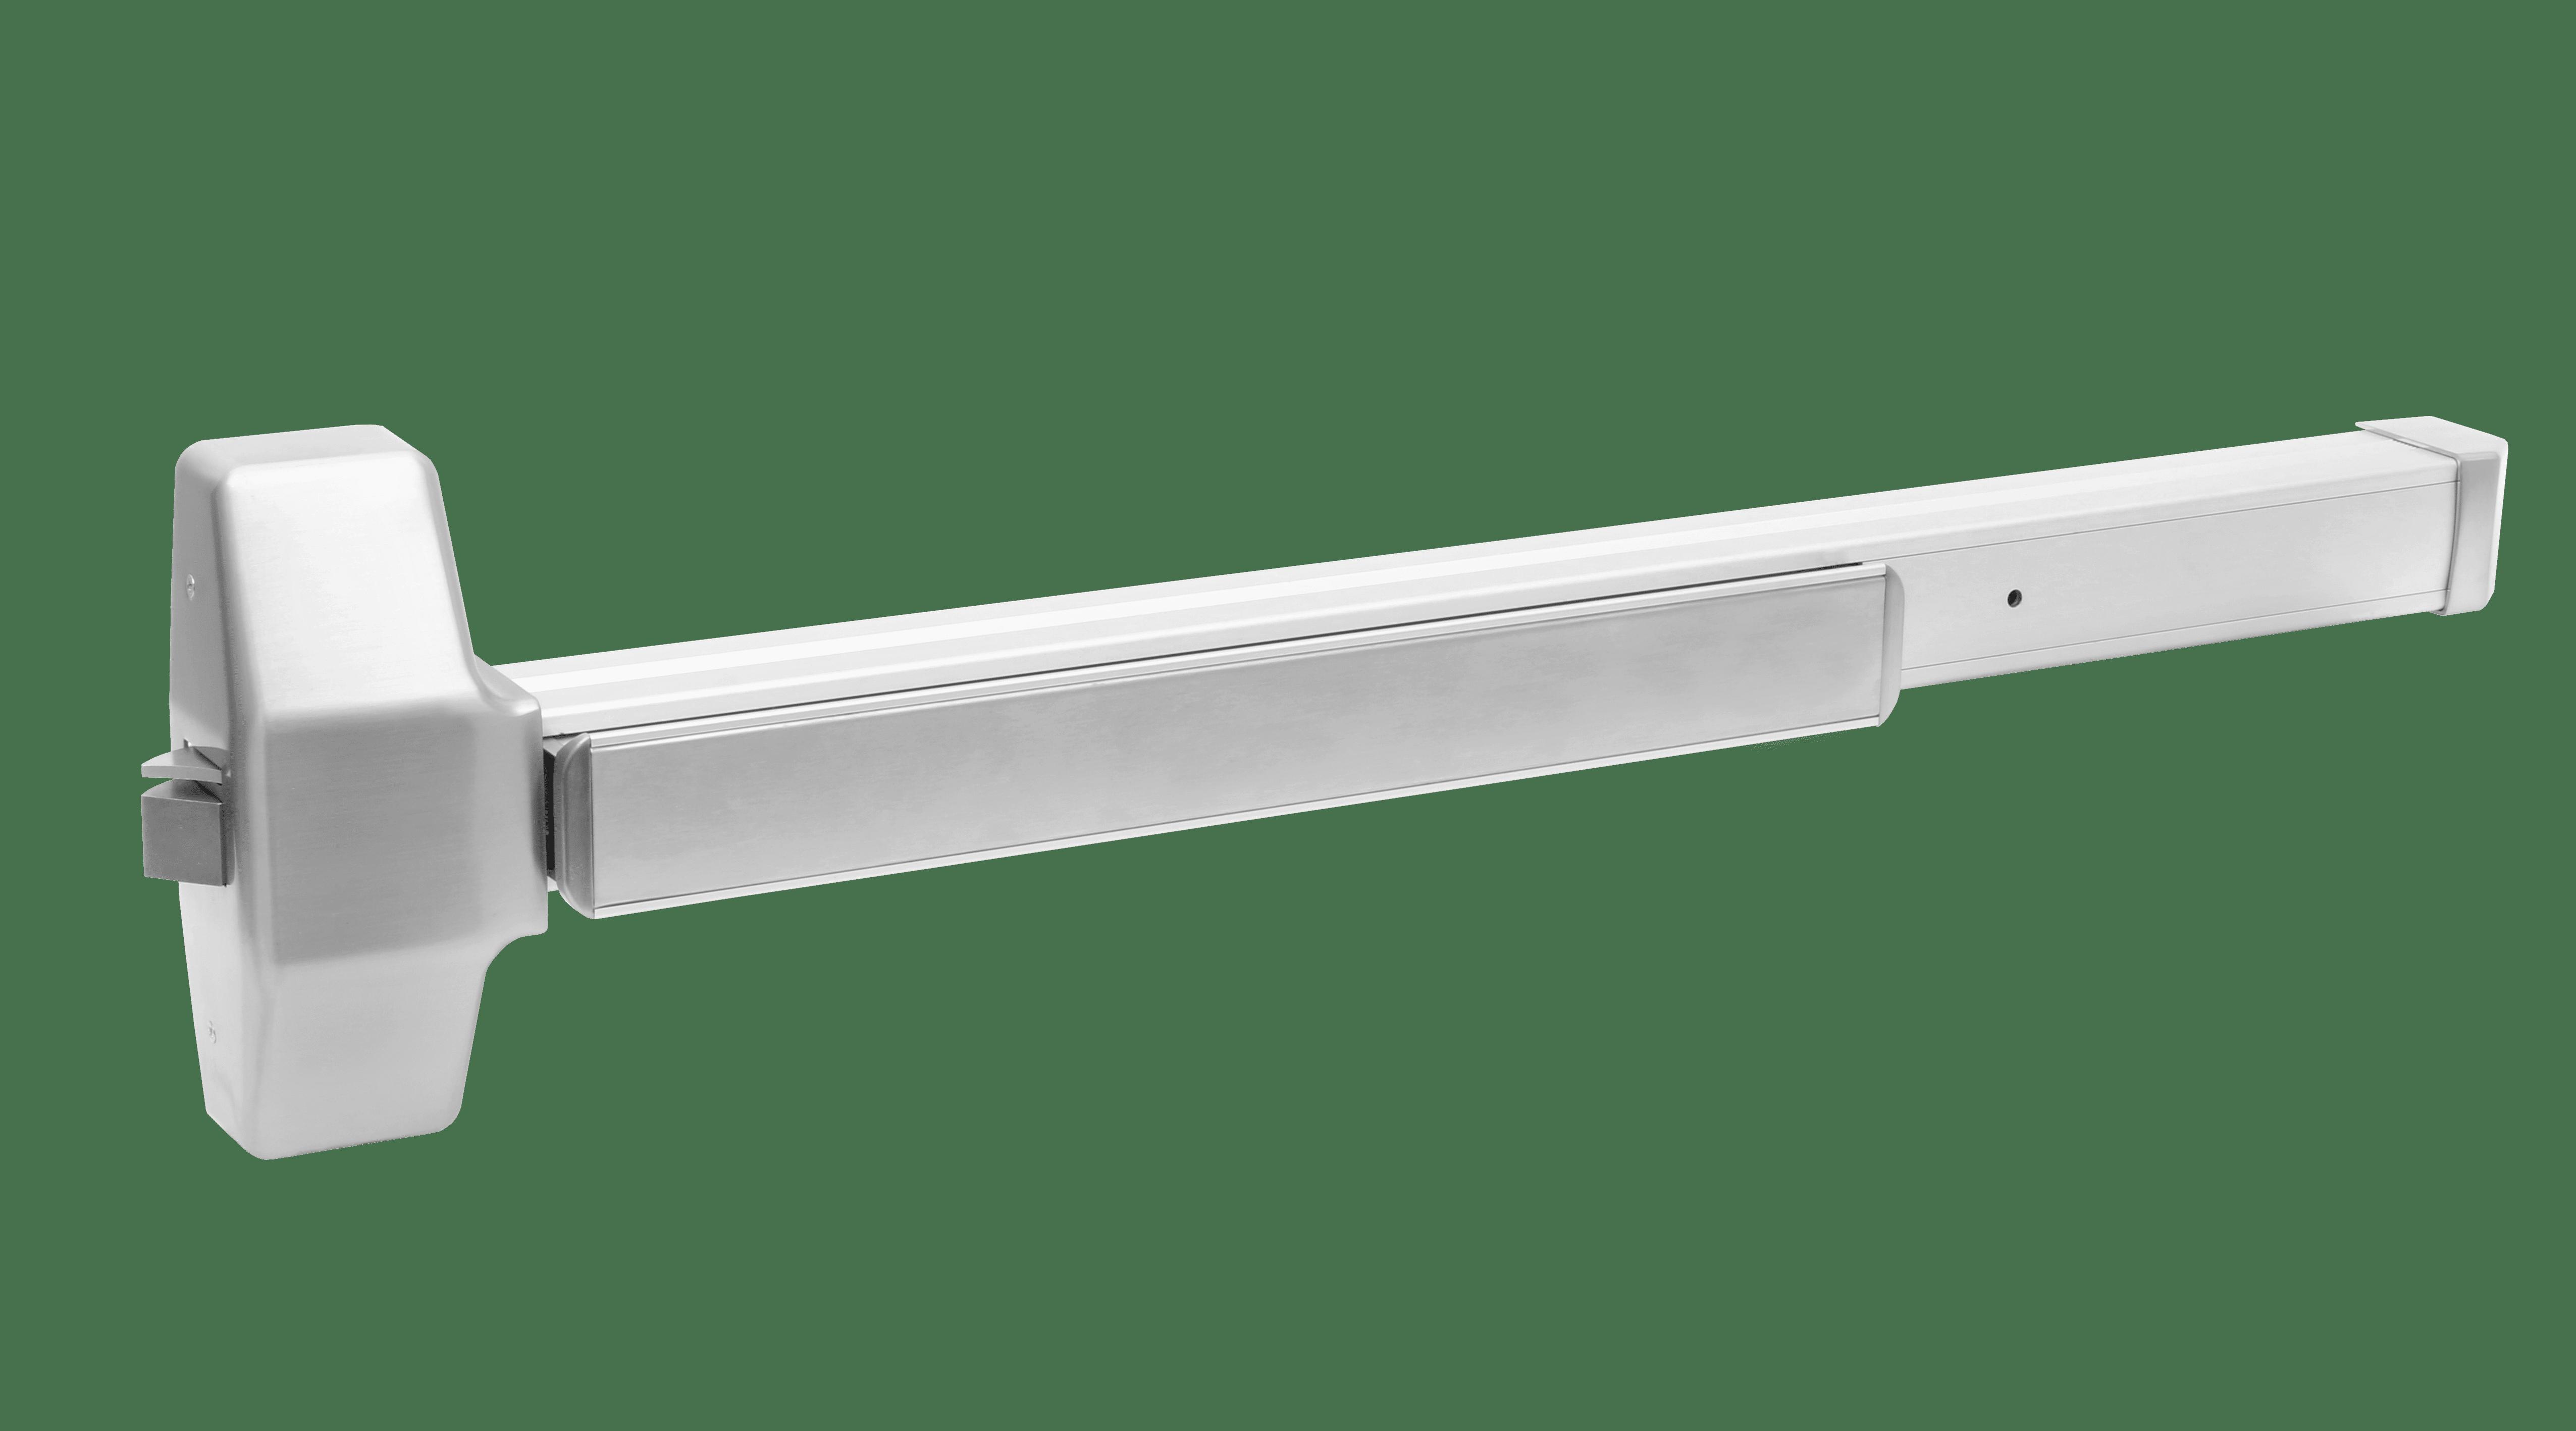 ED-900 Series Grade 1 Heavy Duty Exit Device